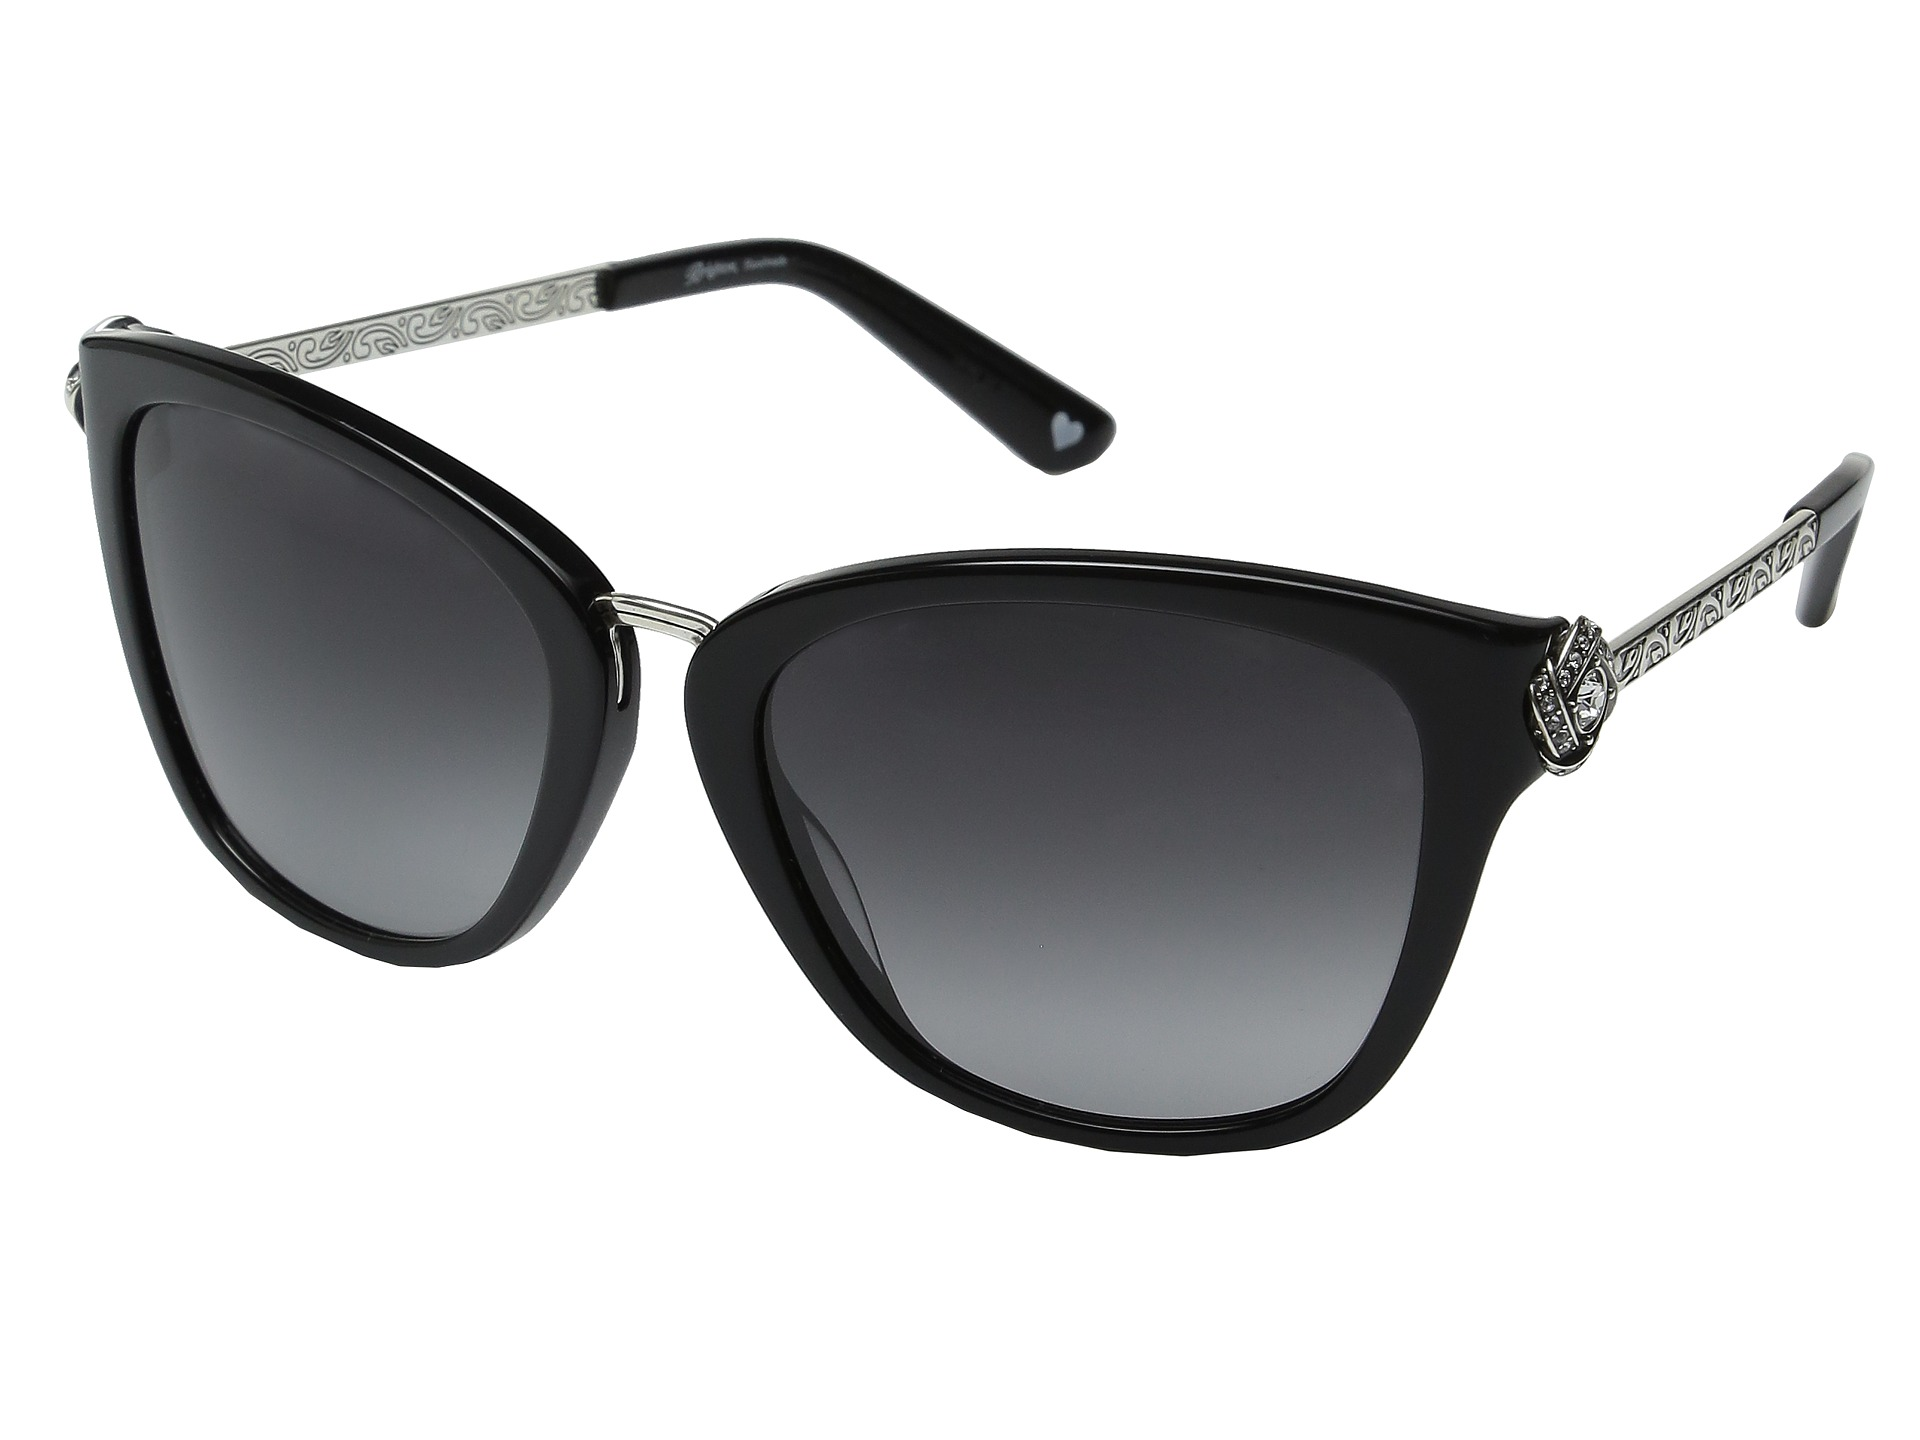 brighton eternity knot sunglasses at zappos